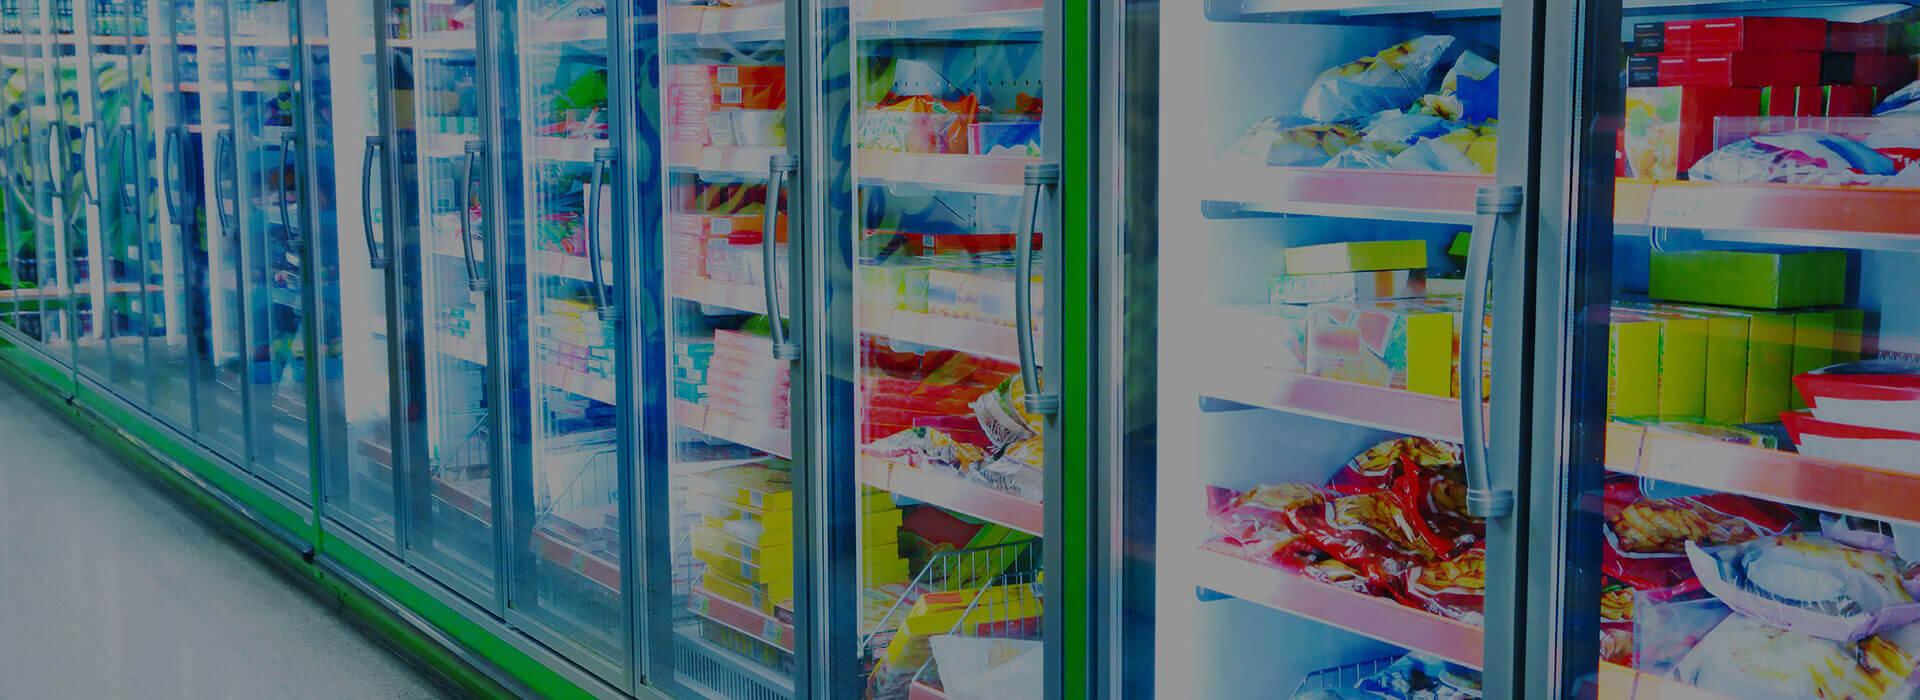 Commercial Refrigerators & Catering Equipment